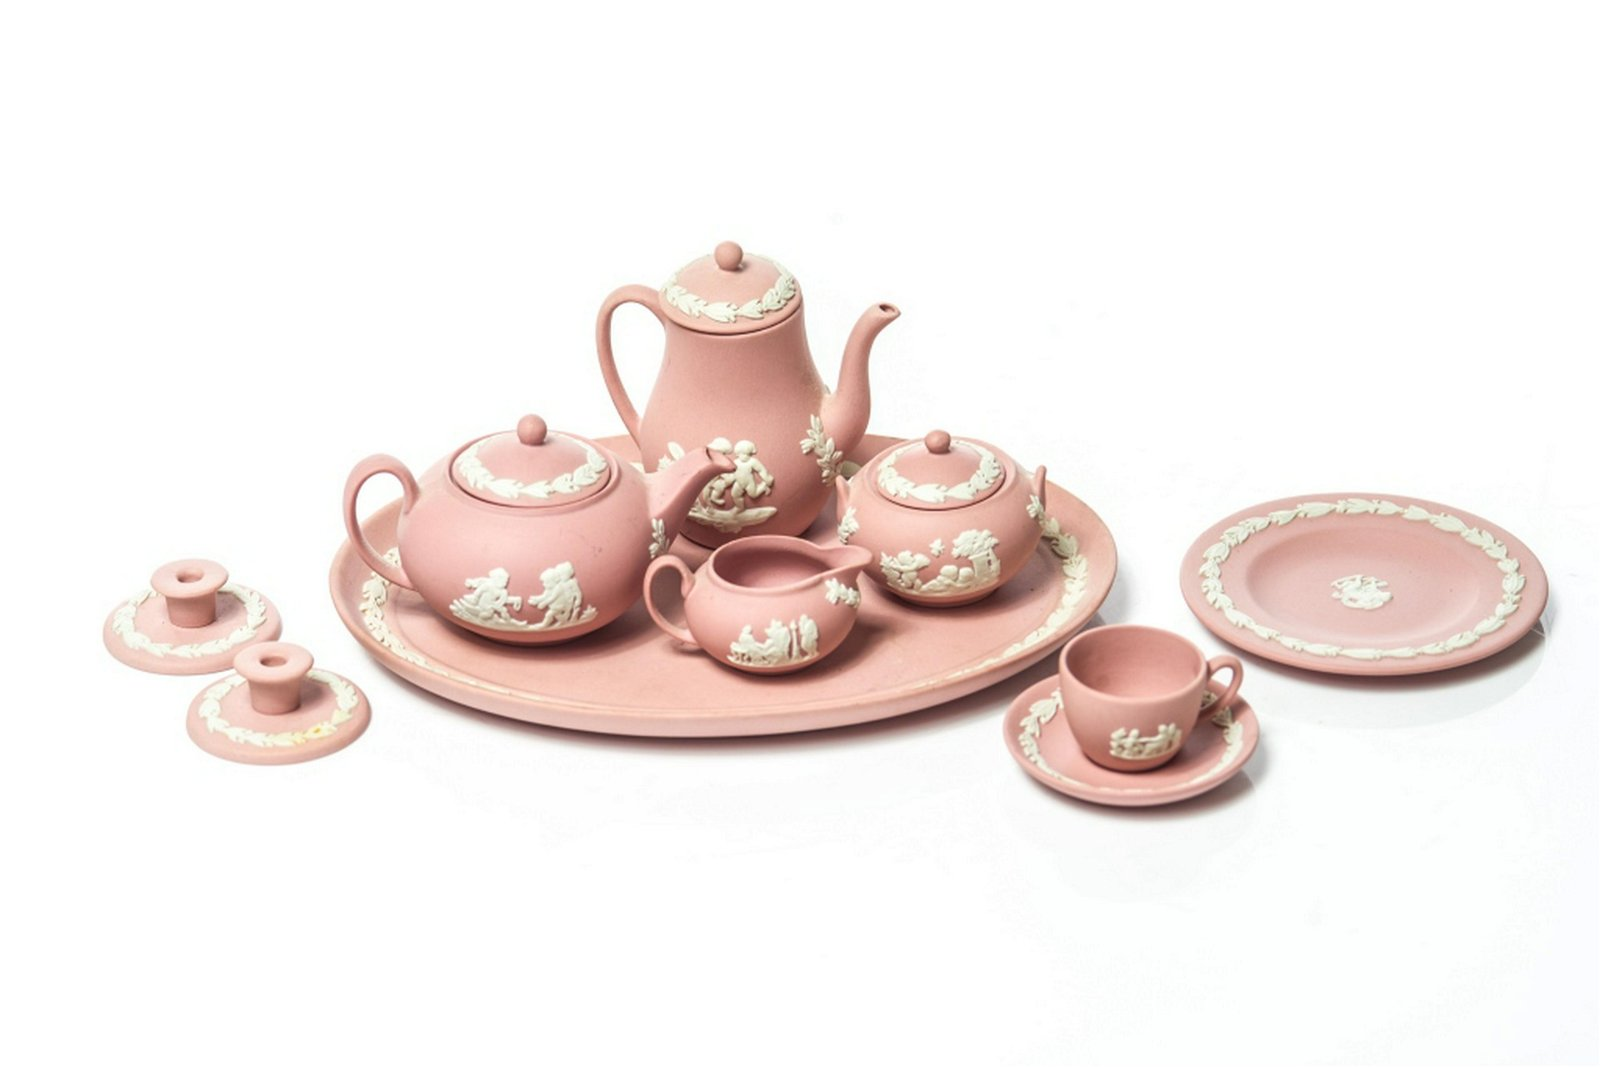 A MINIATURE PINK WEDGWOOD JASPERWARE TEA SET